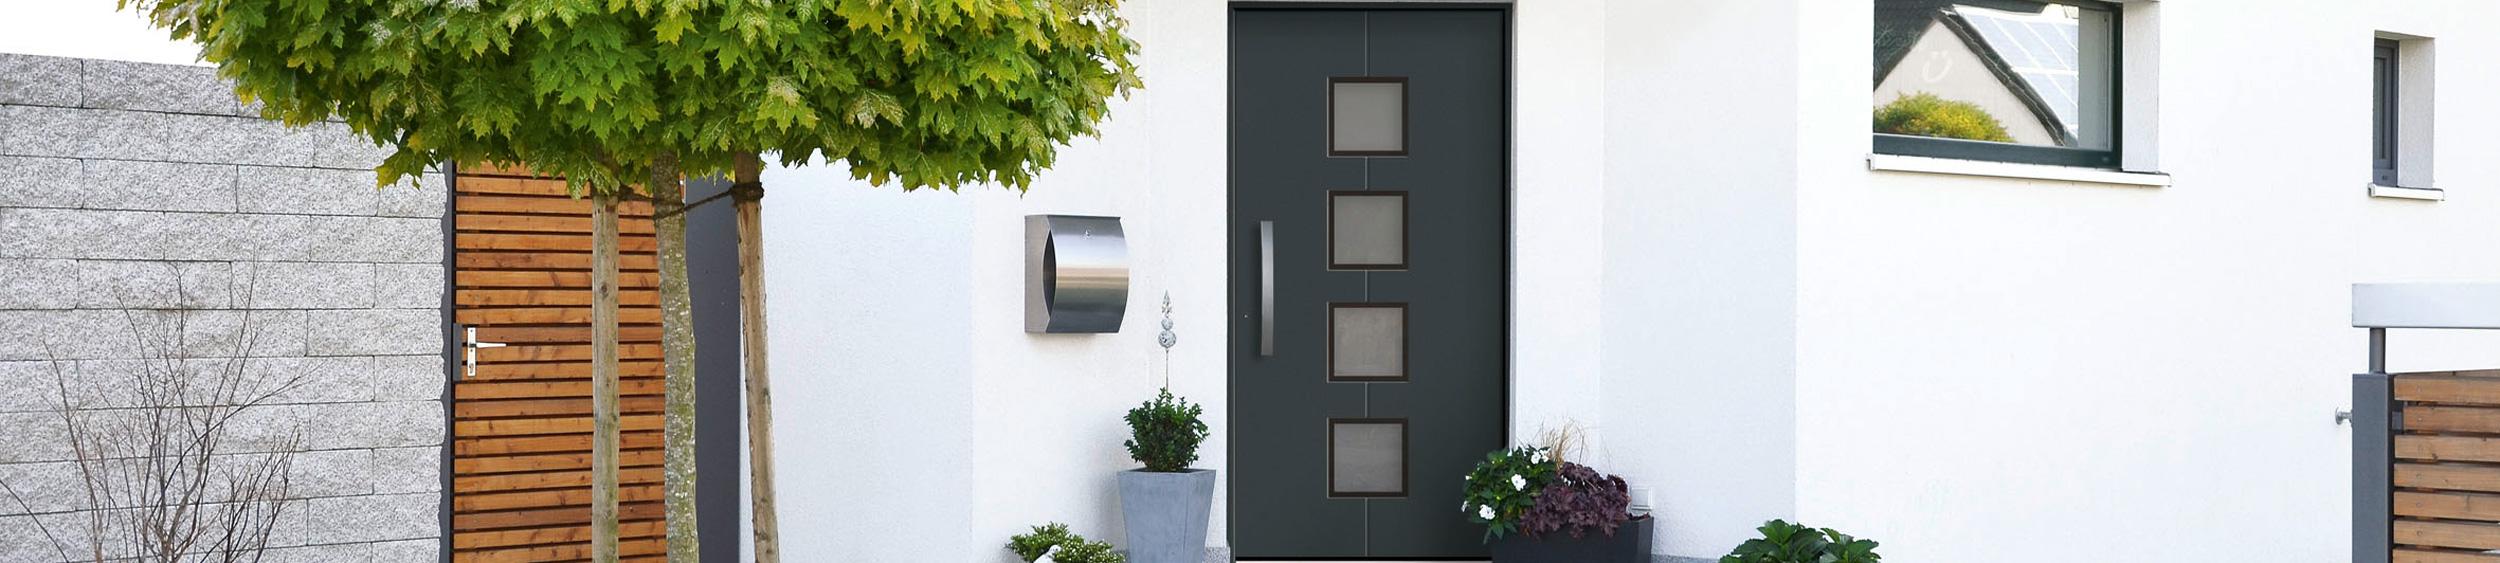 insektenschutz bock bauelemente. Black Bedroom Furniture Sets. Home Design Ideas